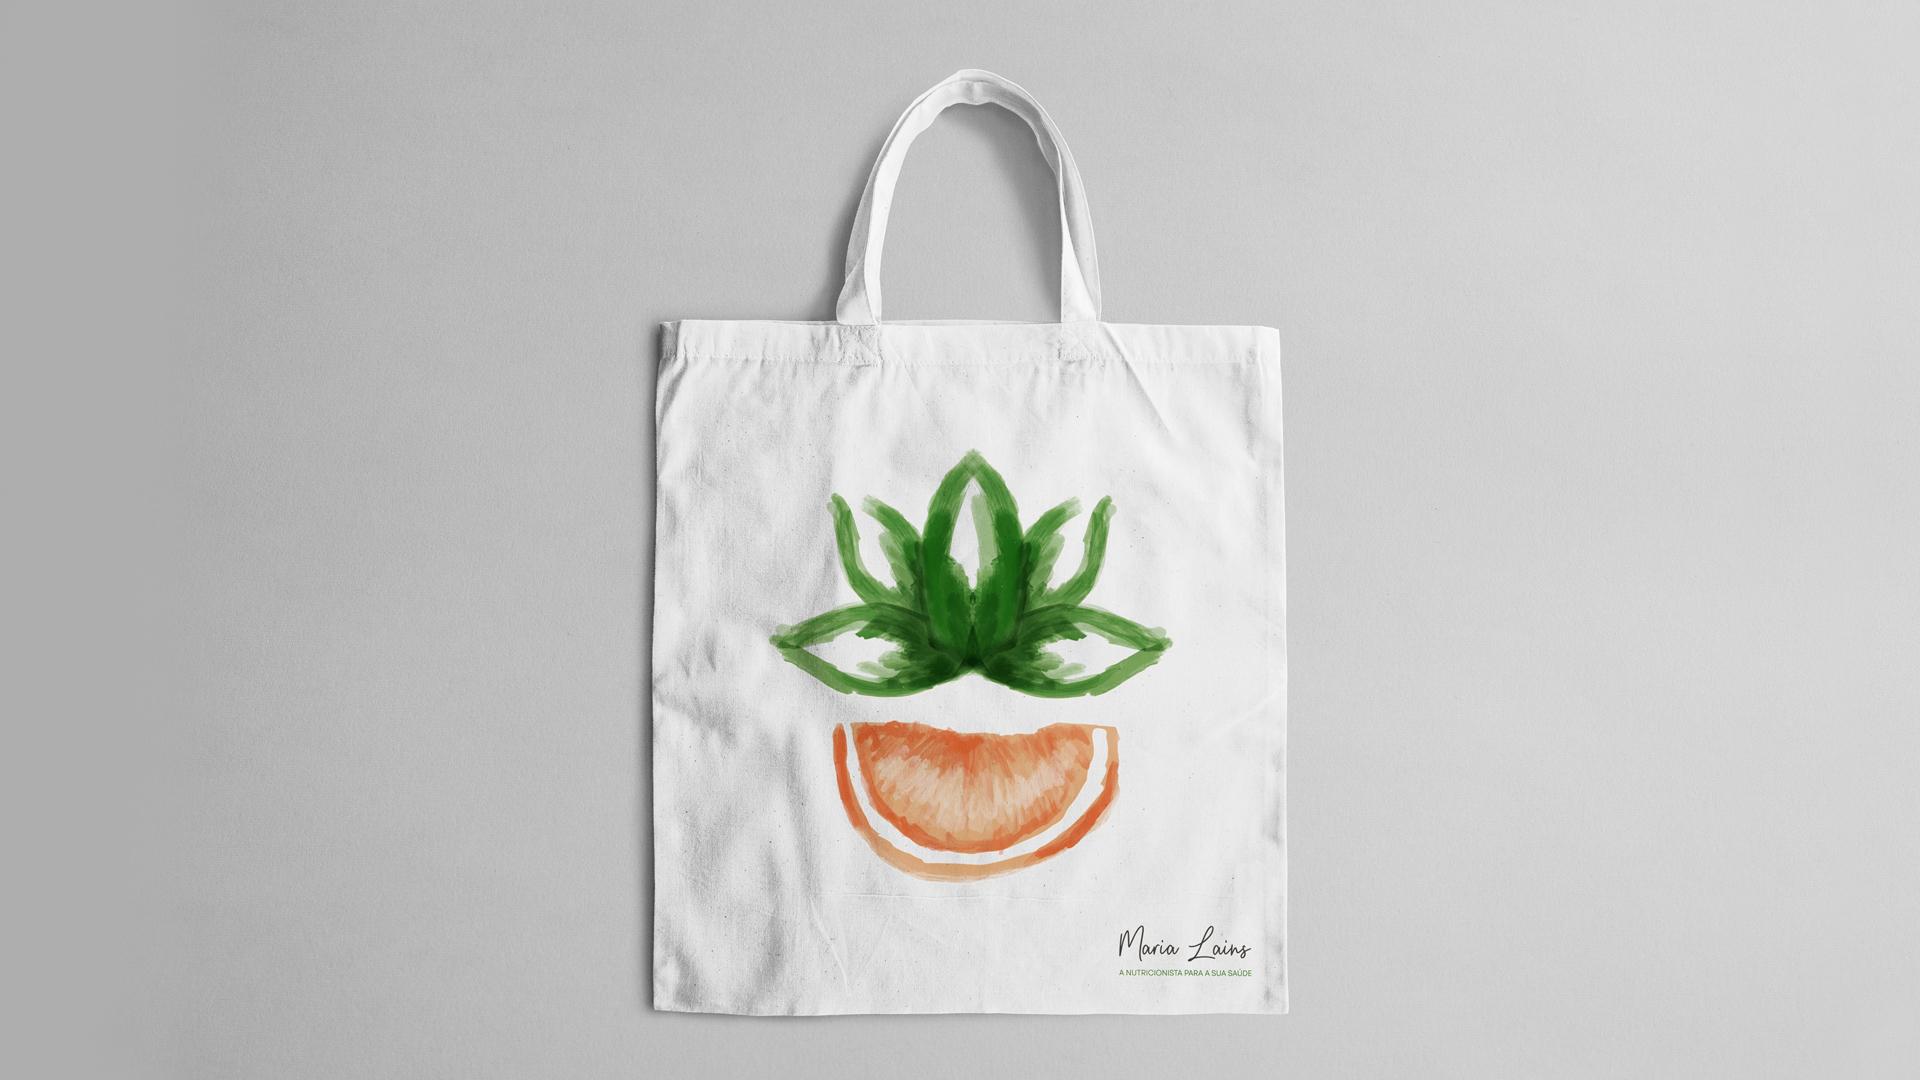 Wellness Brand Design - Nutriotionist Logo with original illustrations